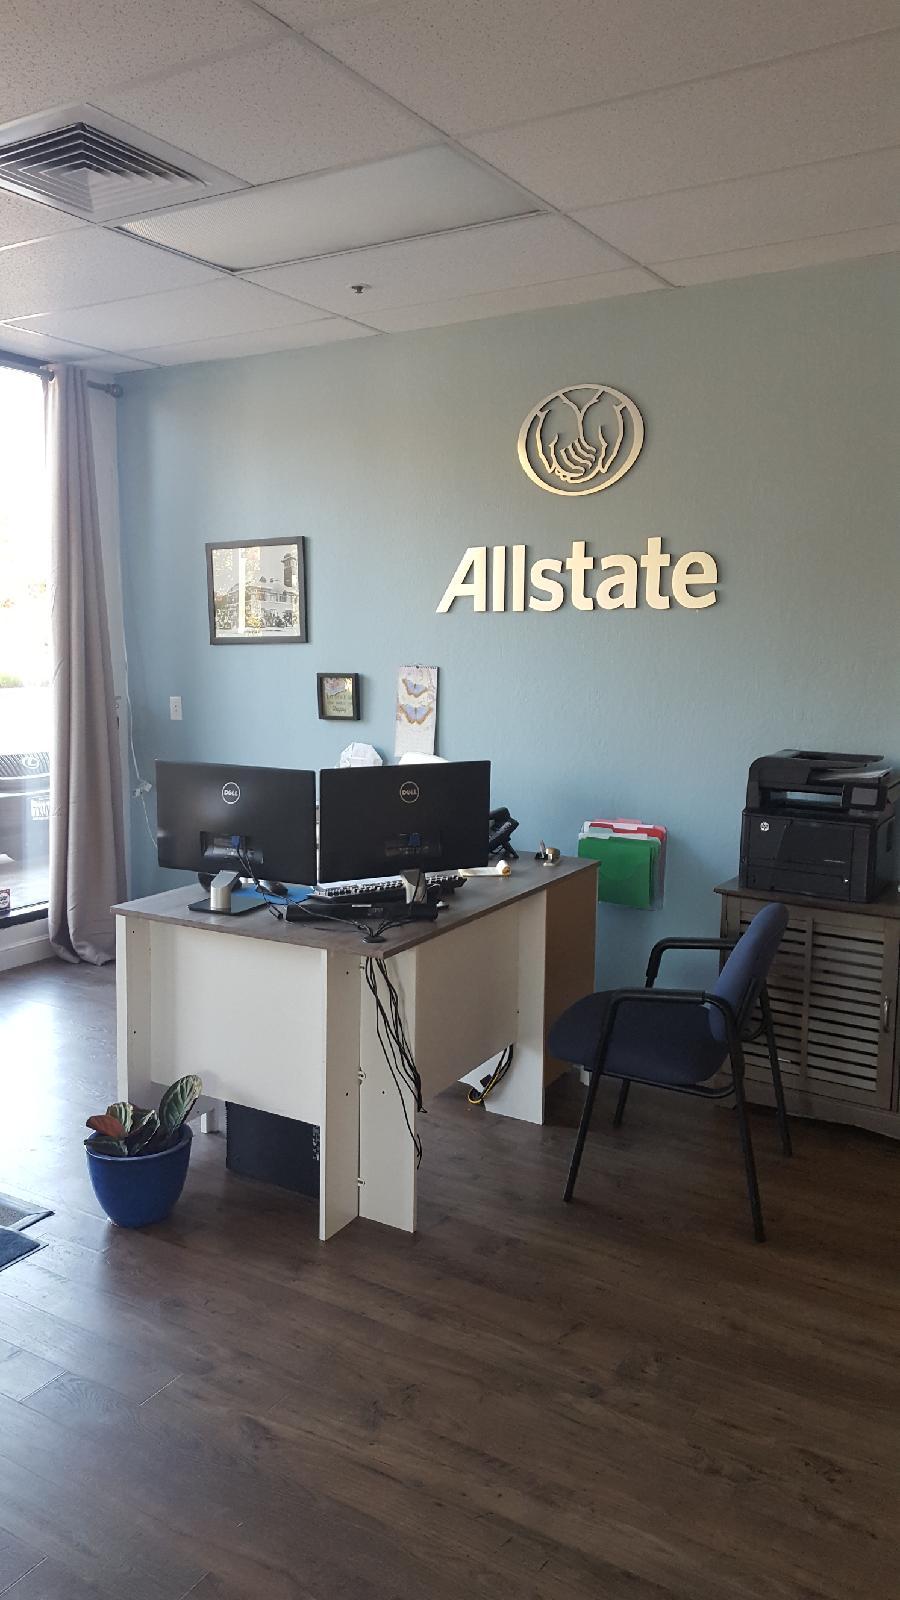 Alissa Gutierres: Allstate Insurance image 5